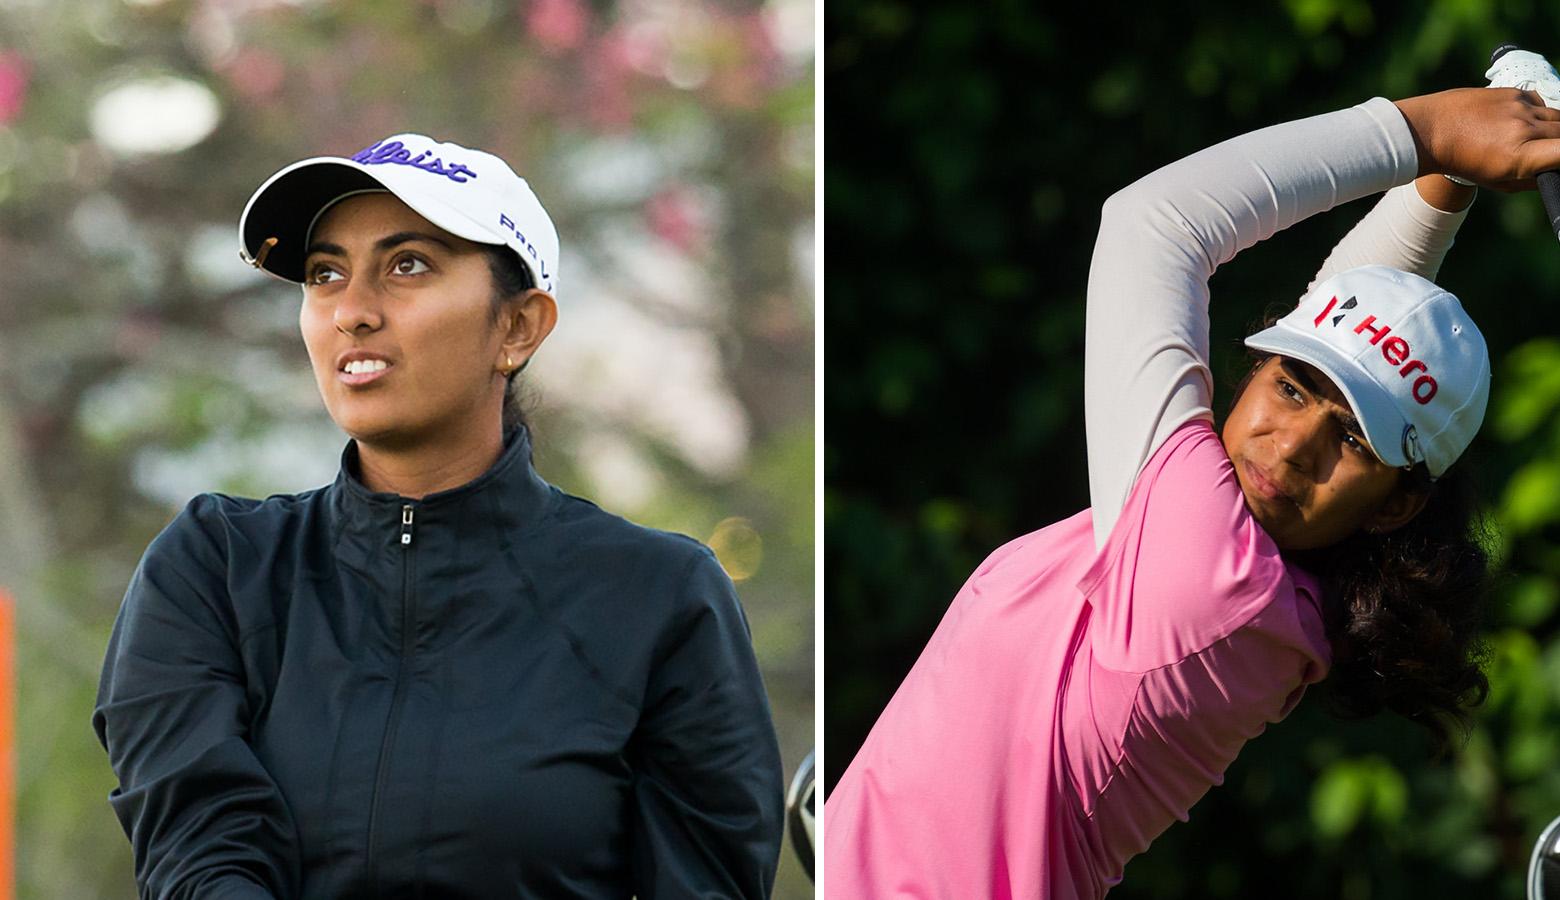 Diksha rides a roller coaster to rise to 17th in Dubai; Aditi, too, rises to 17th